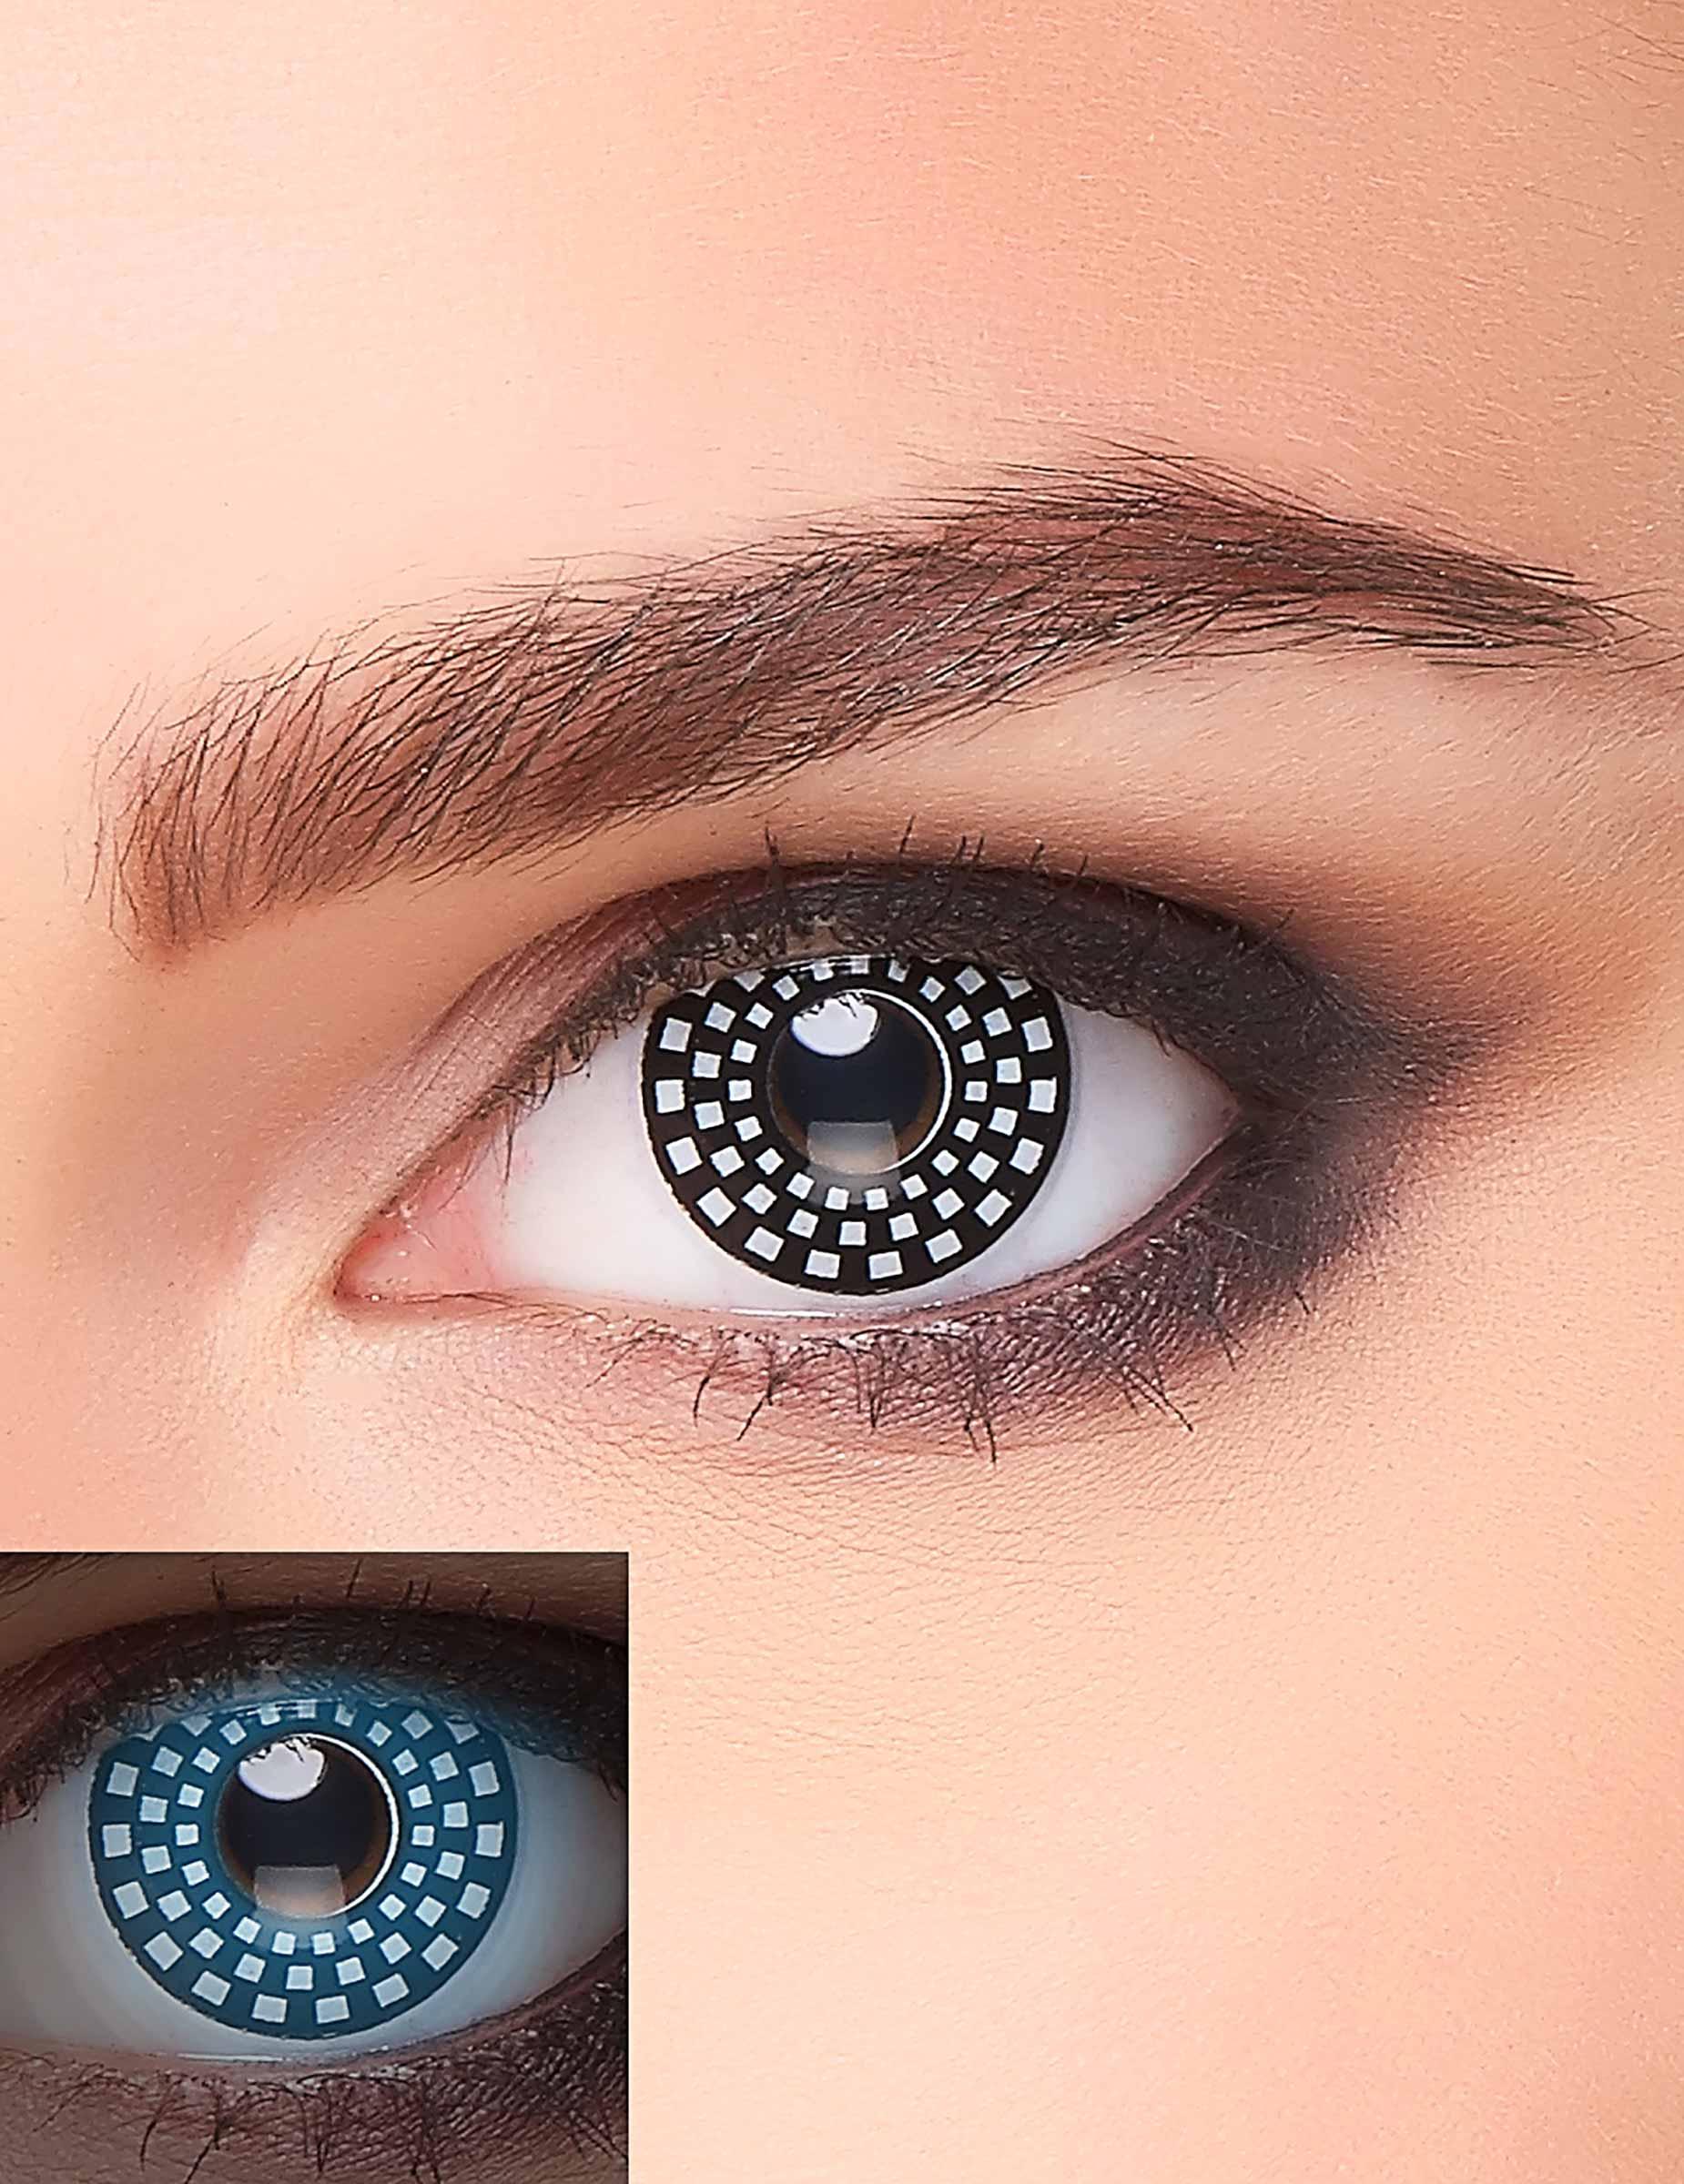 kontaktlinsen f r erwachsene im raster design schminke. Black Bedroom Furniture Sets. Home Design Ideas